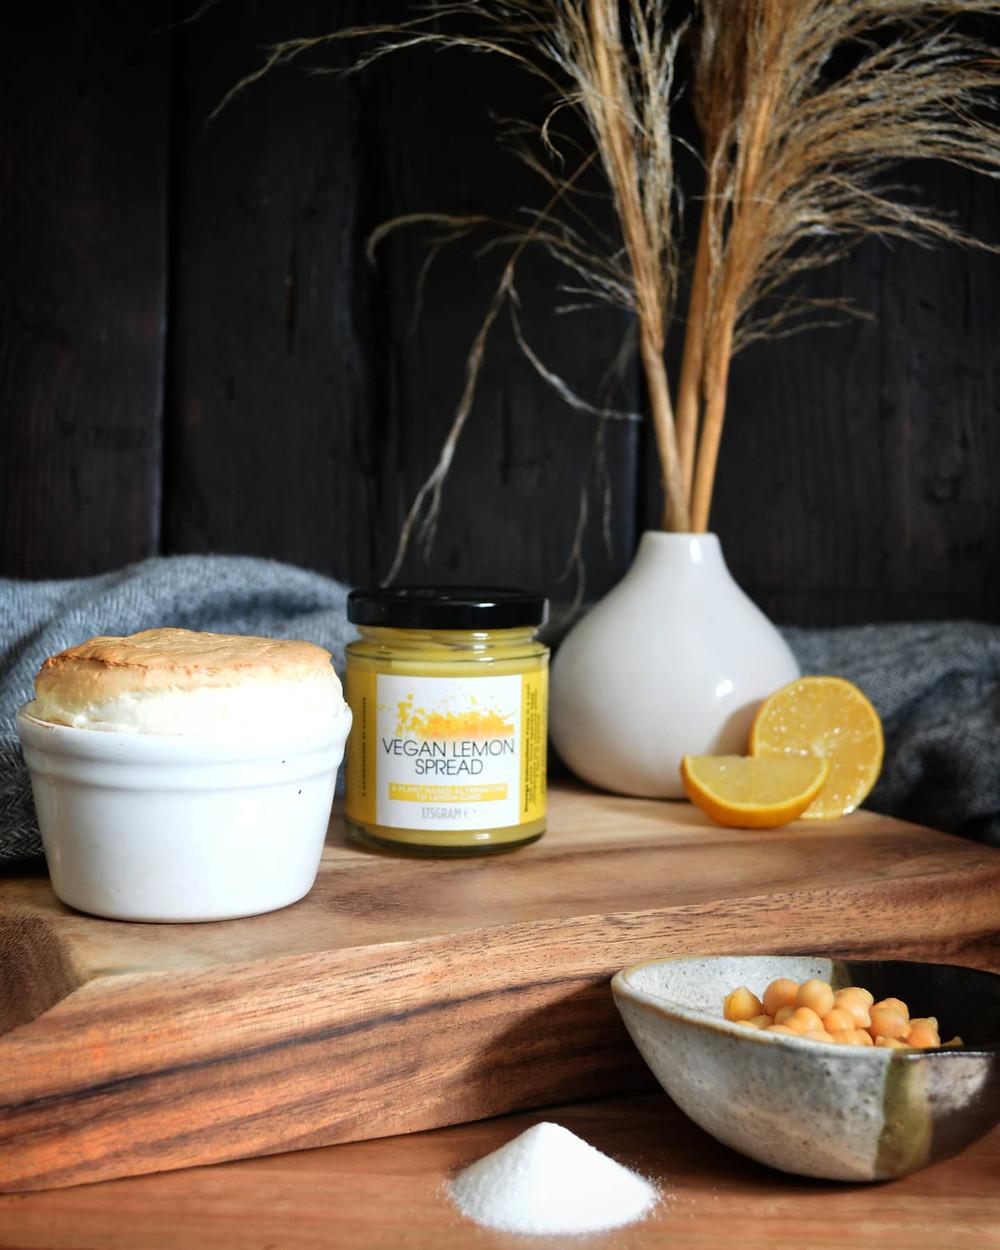 Vegan lemon soufflé pictured with Janda Food's jar of lemon spread, a freshly sliced lemon, chickpeas and sugar.